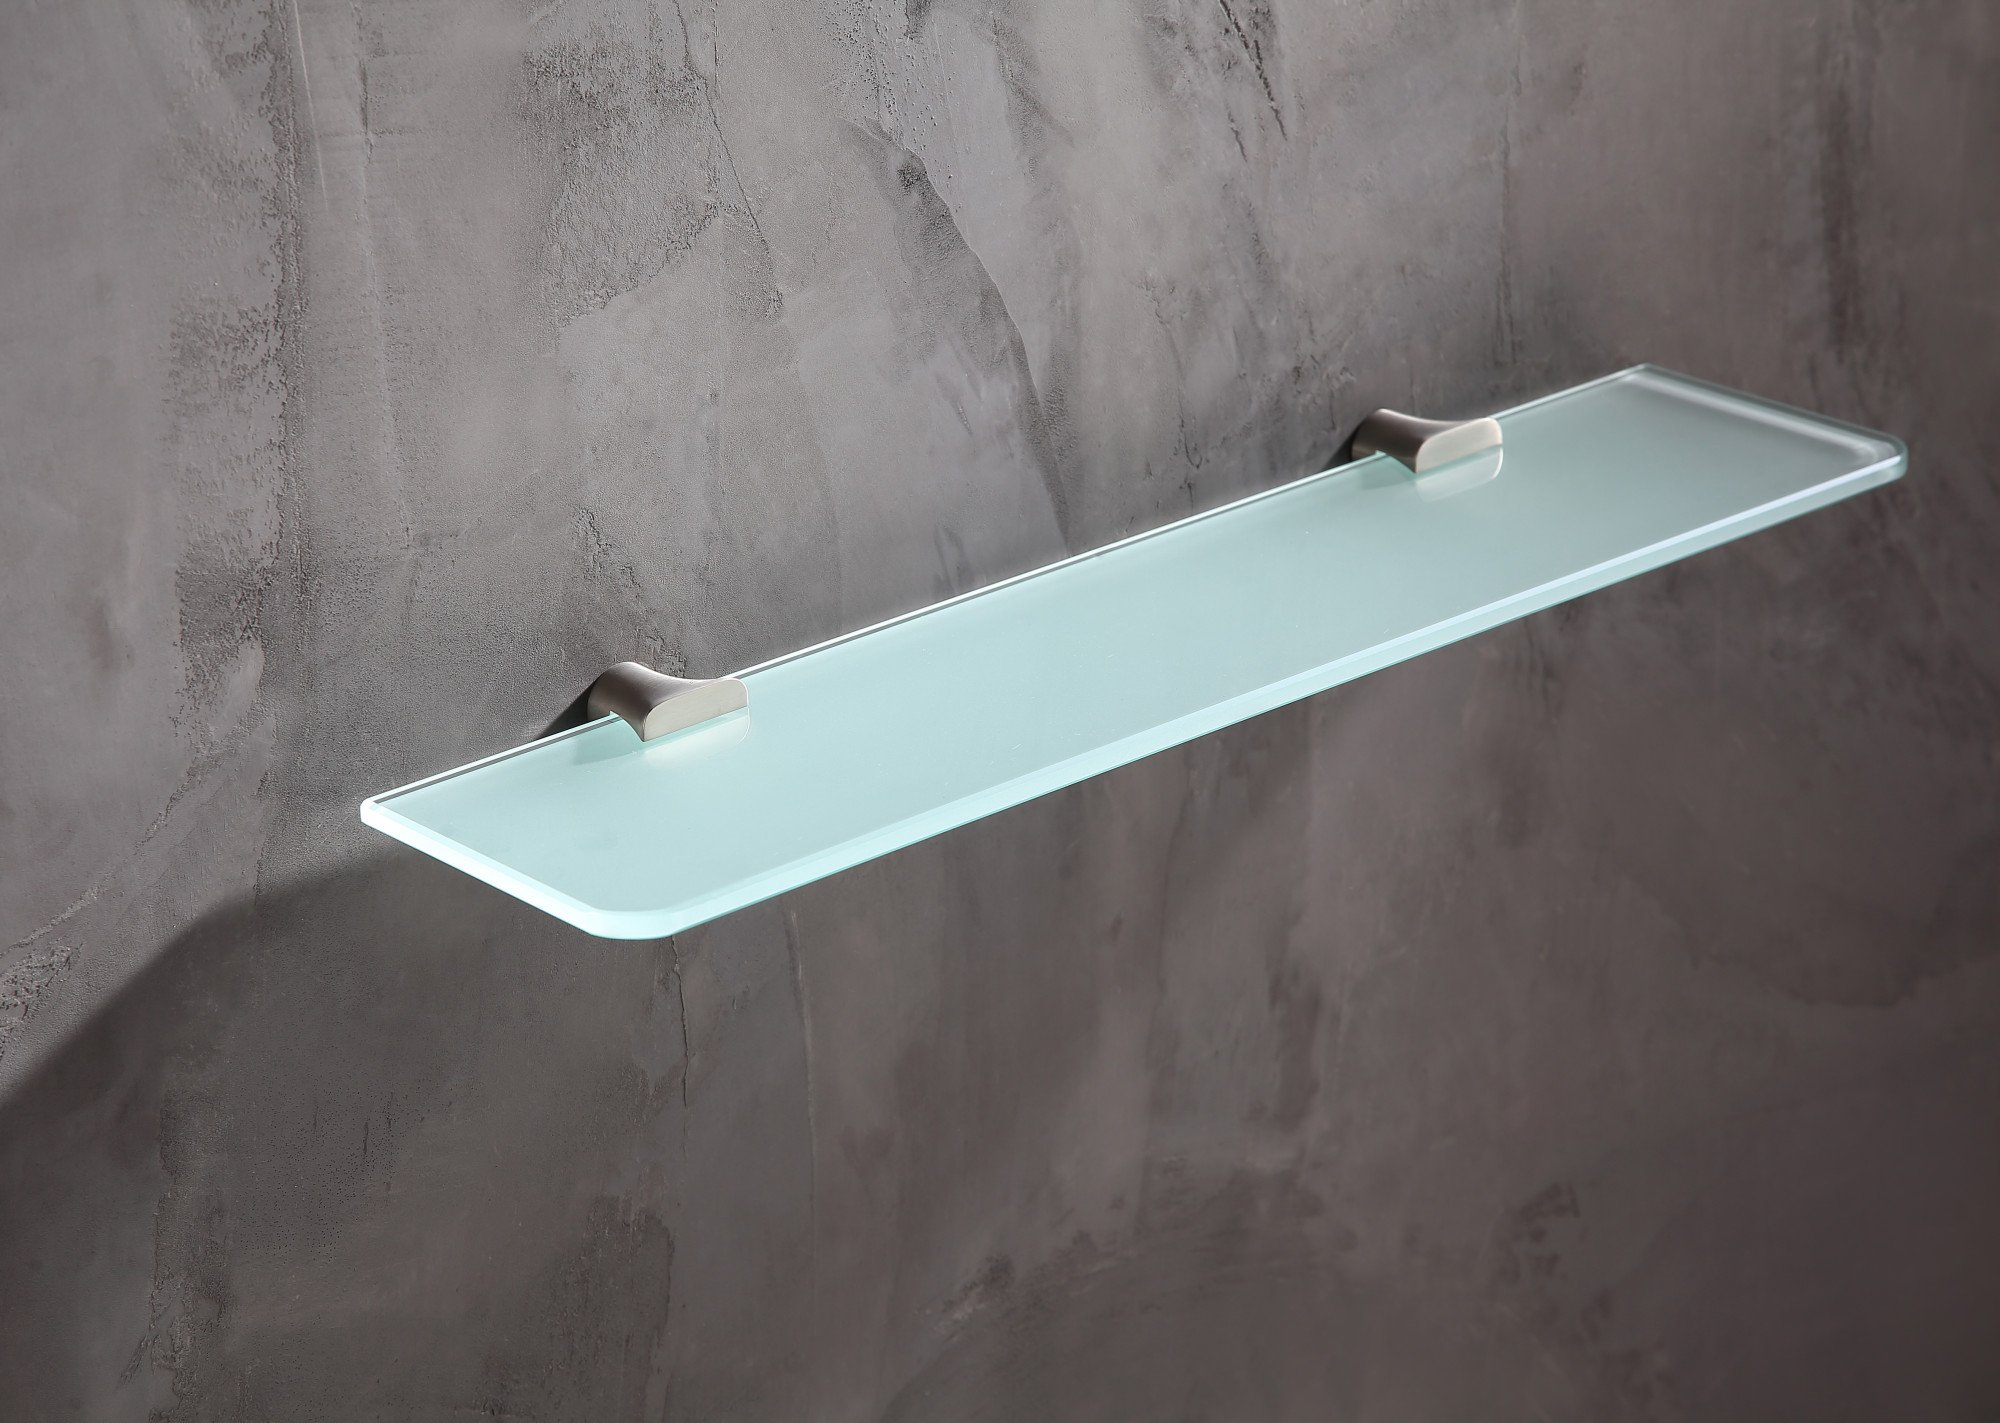 19.69'' Glass Shelf - Brushed Nickel - Essence Series AC-AZ050BN - ANZZI by ANZZI (Image #2)